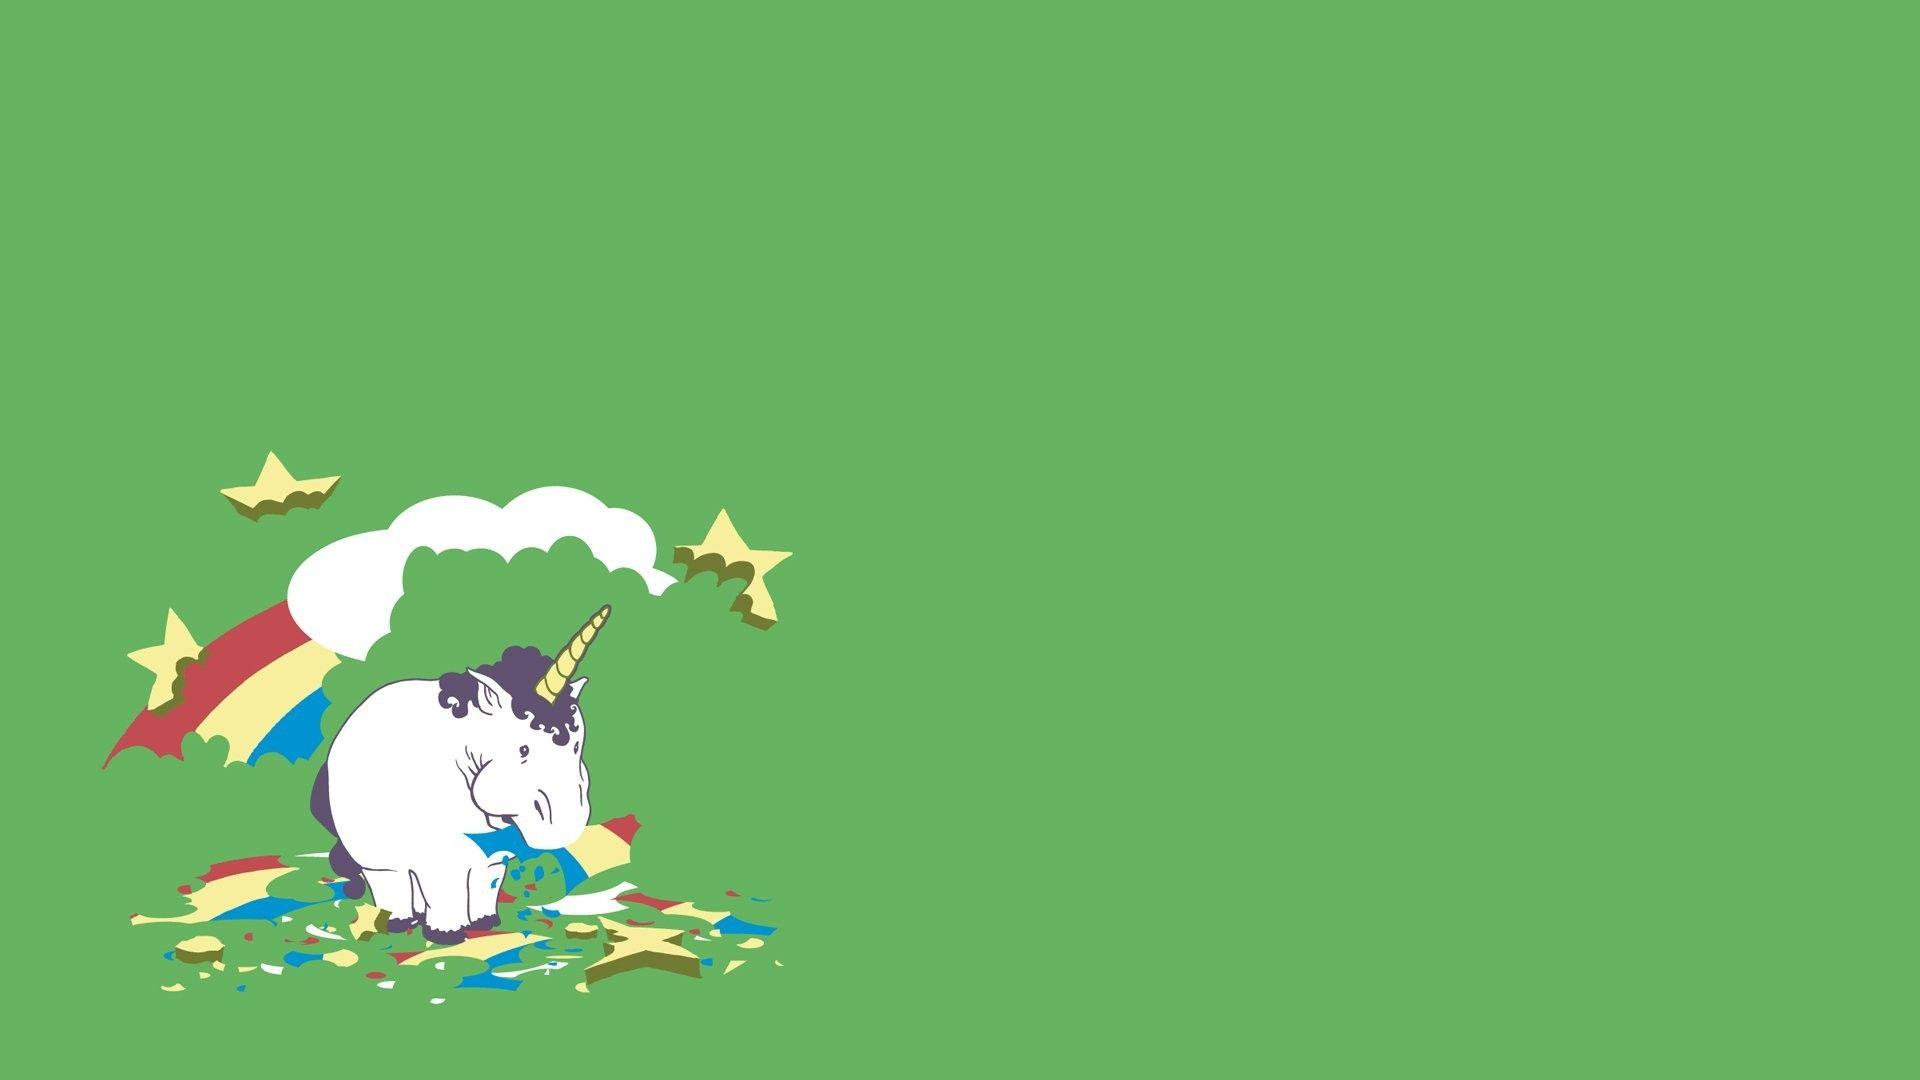 Wallpaper Cute Unicorn Desktop Best Wallpaper Hd In 2020 Unicorn Wallpaper Unicorn Pictures Unicorn Funny